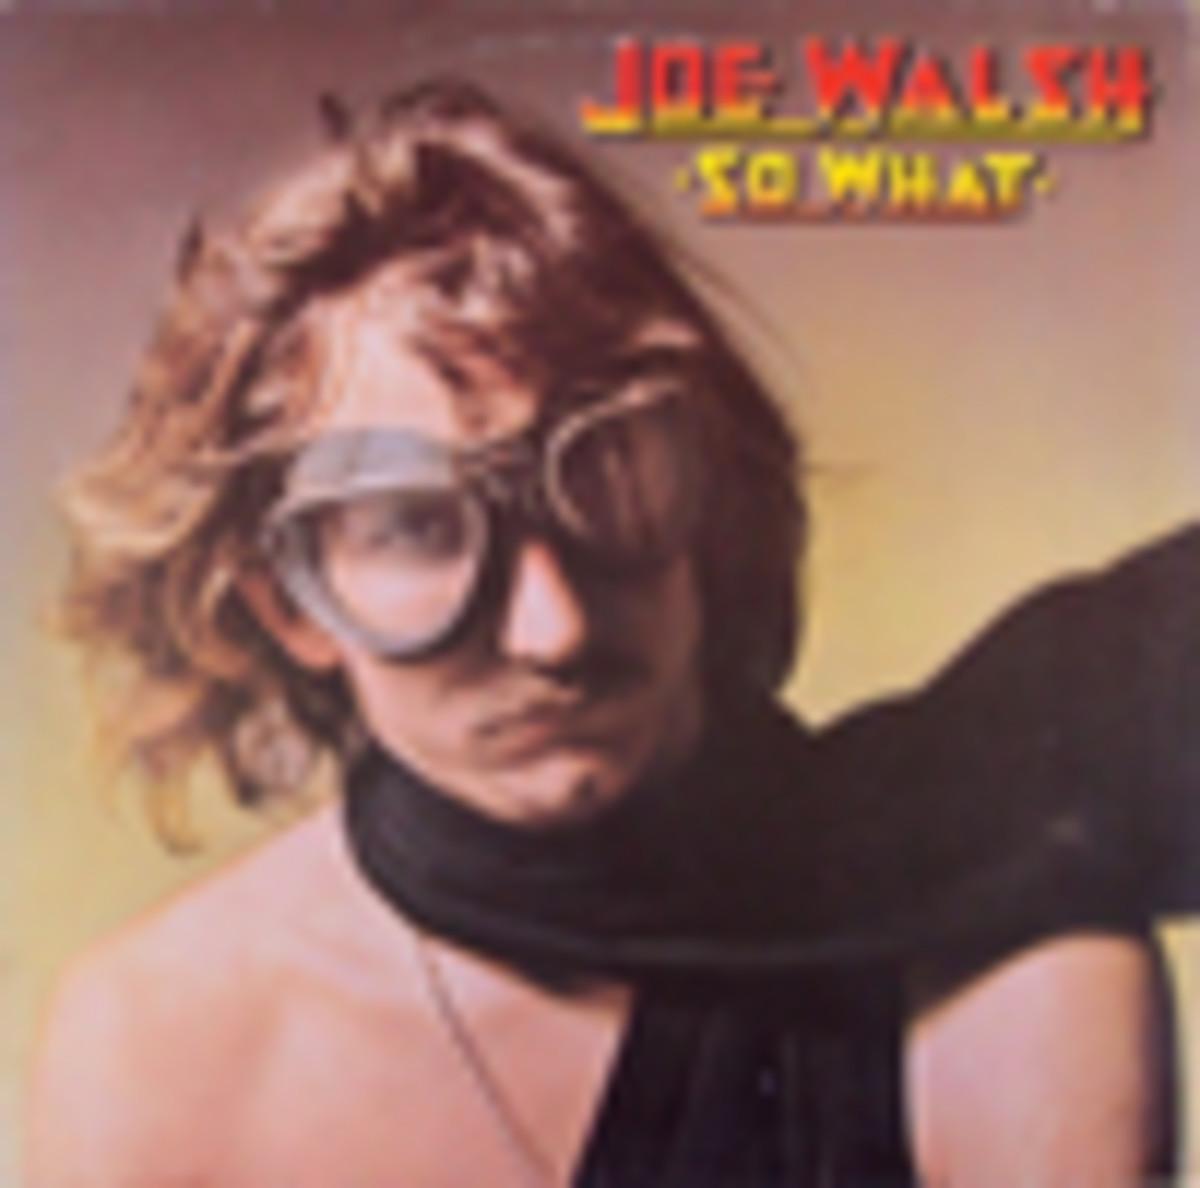 Joe Walsh So What